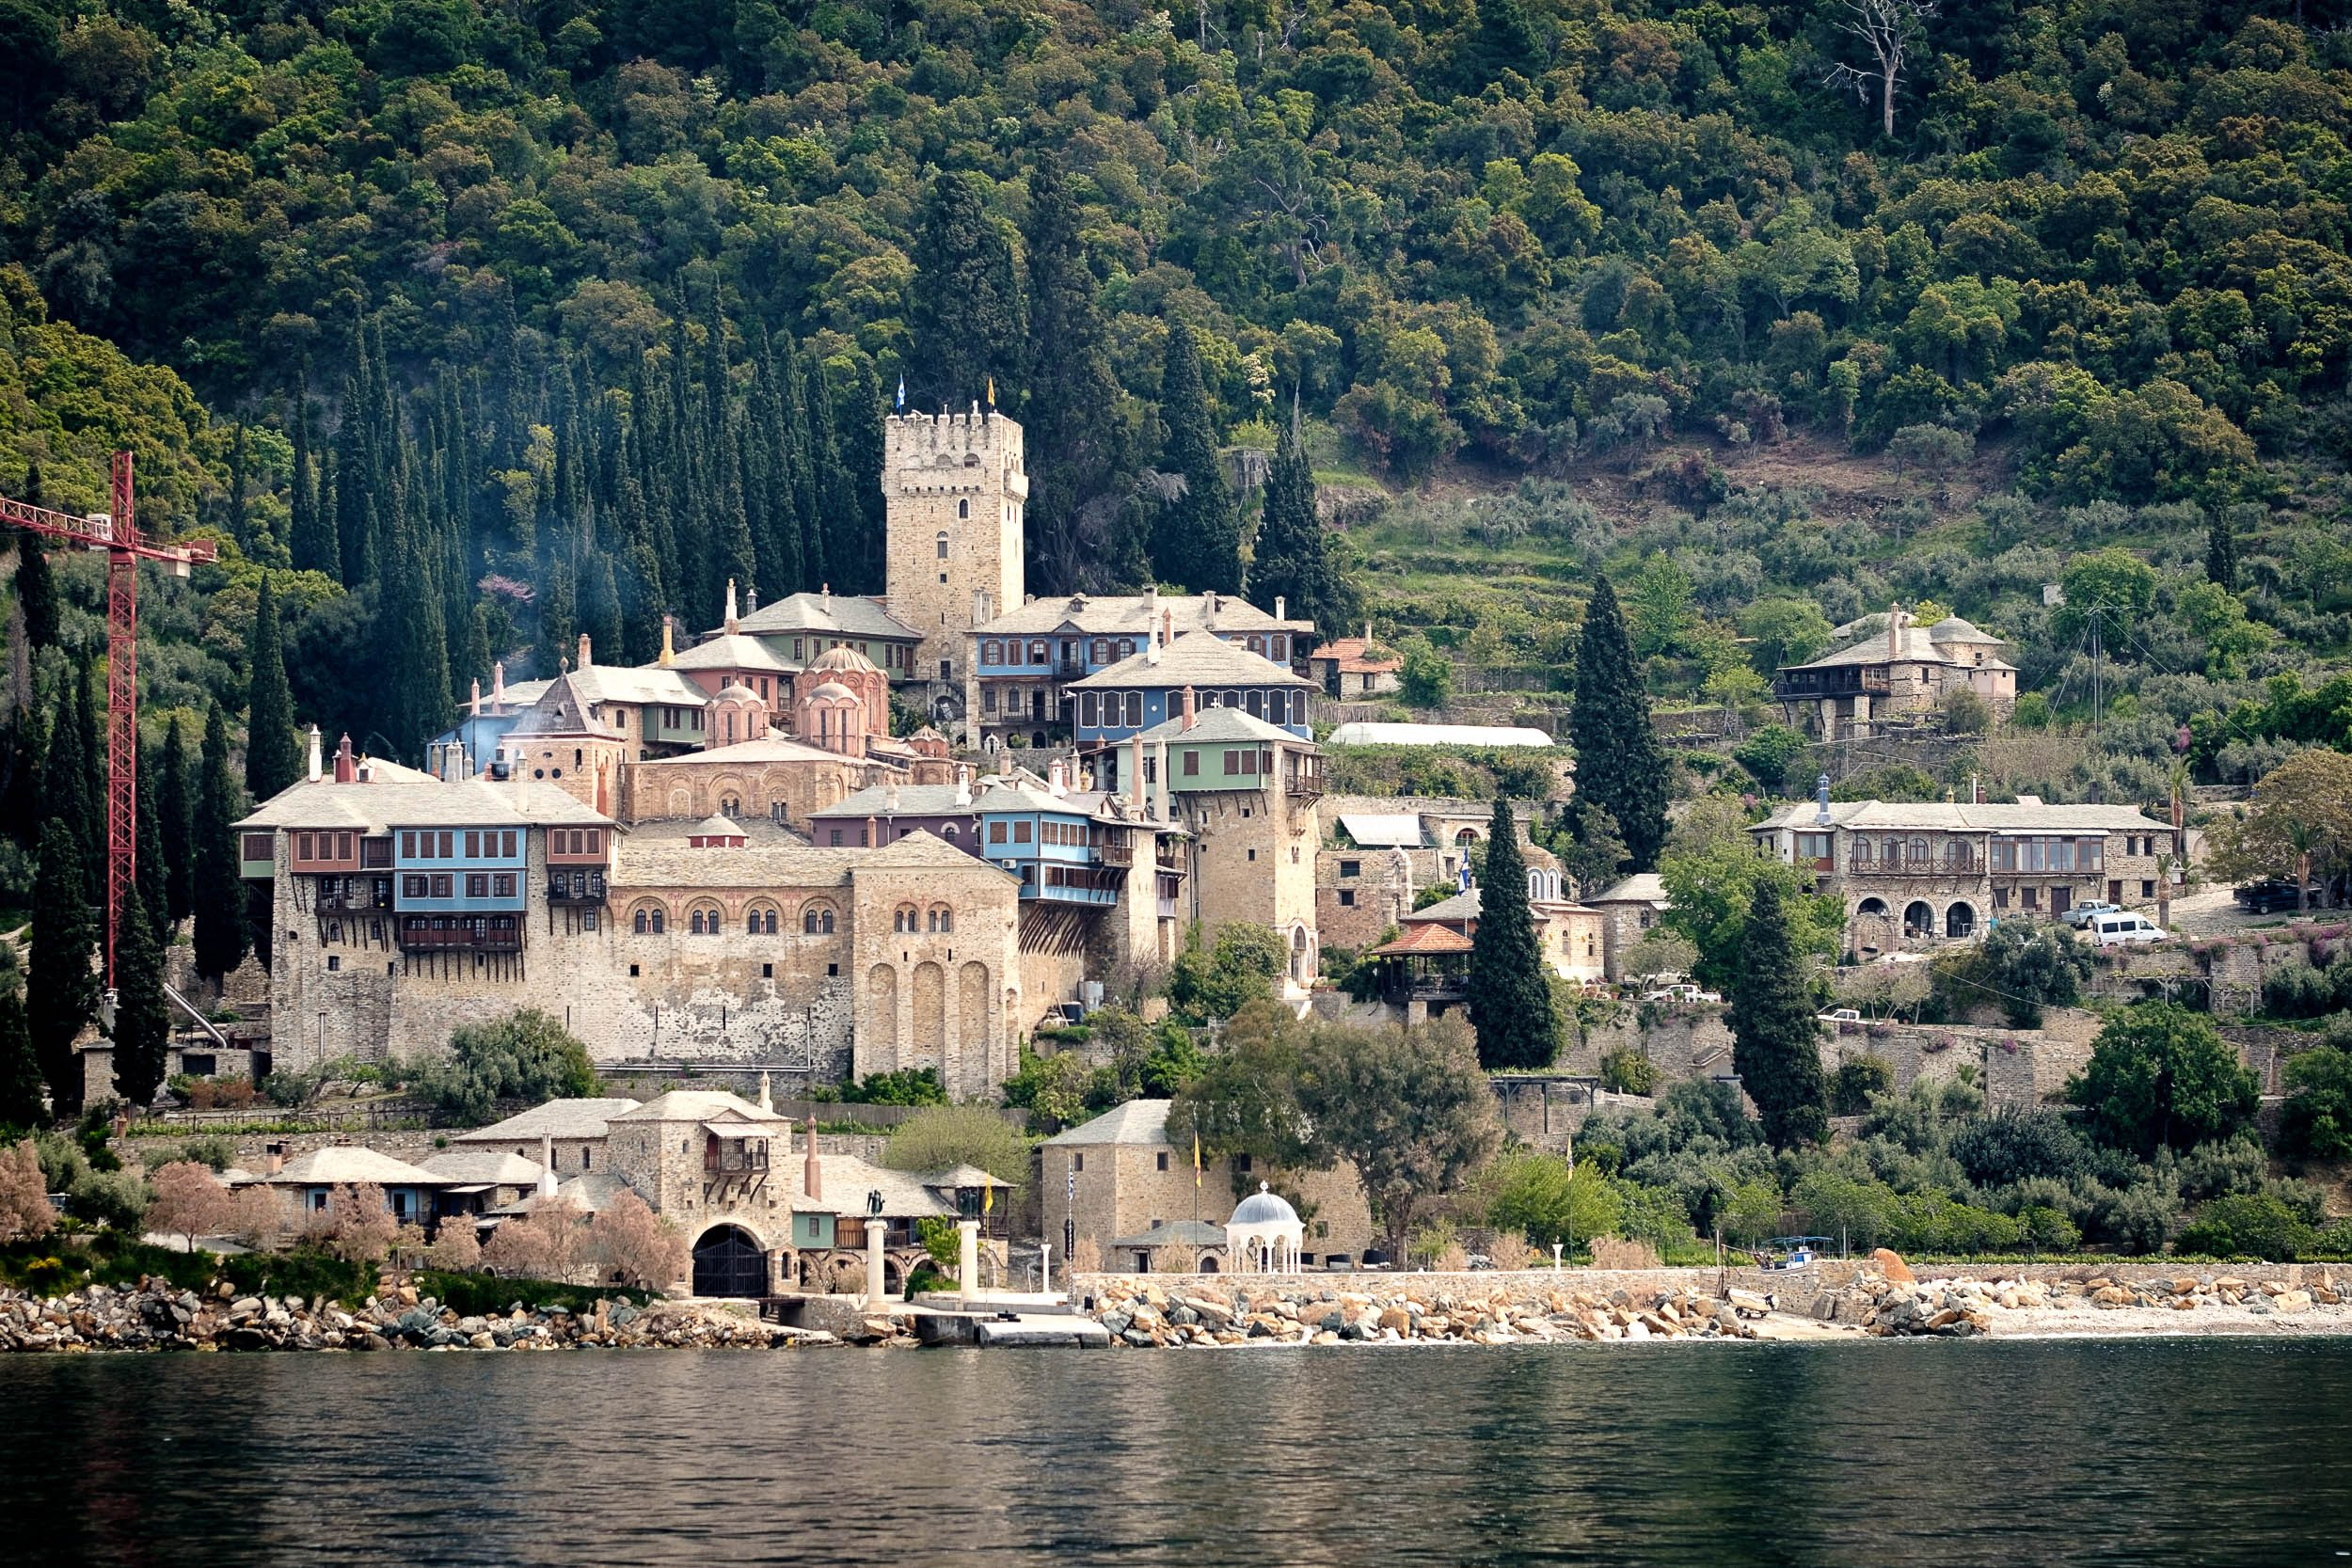 Kloster Dochiariou Mönchsrepublik Athos, Griechenland, Ägäis